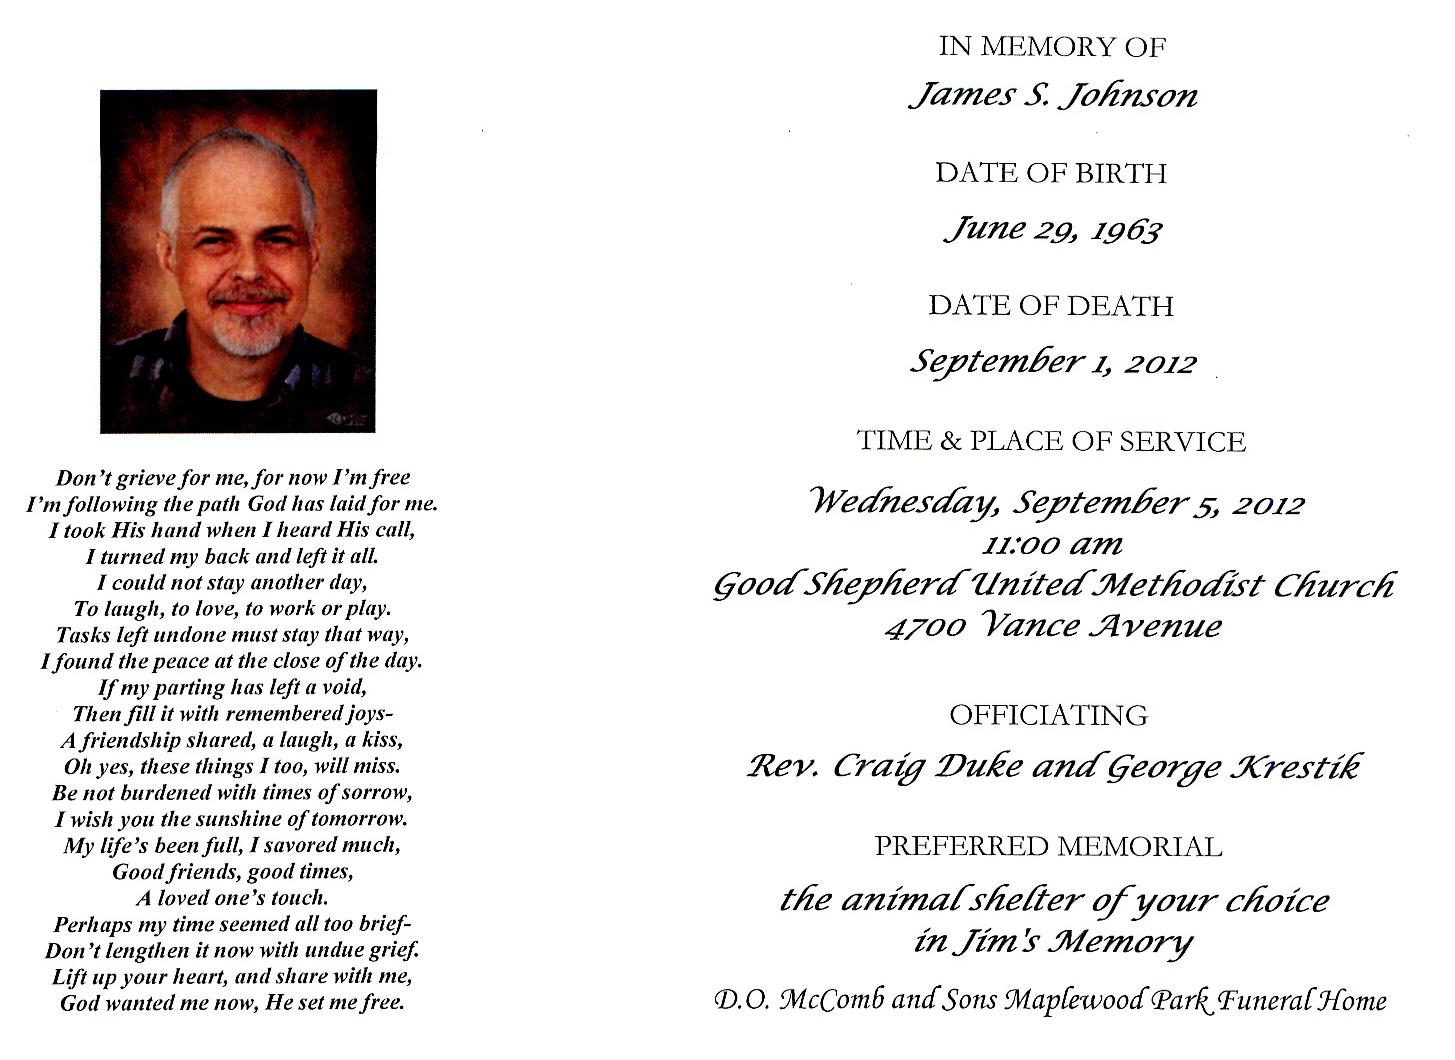 Good shepherd funeral home rome ga - Craig Duke George Krestik Good Shepherd U M C